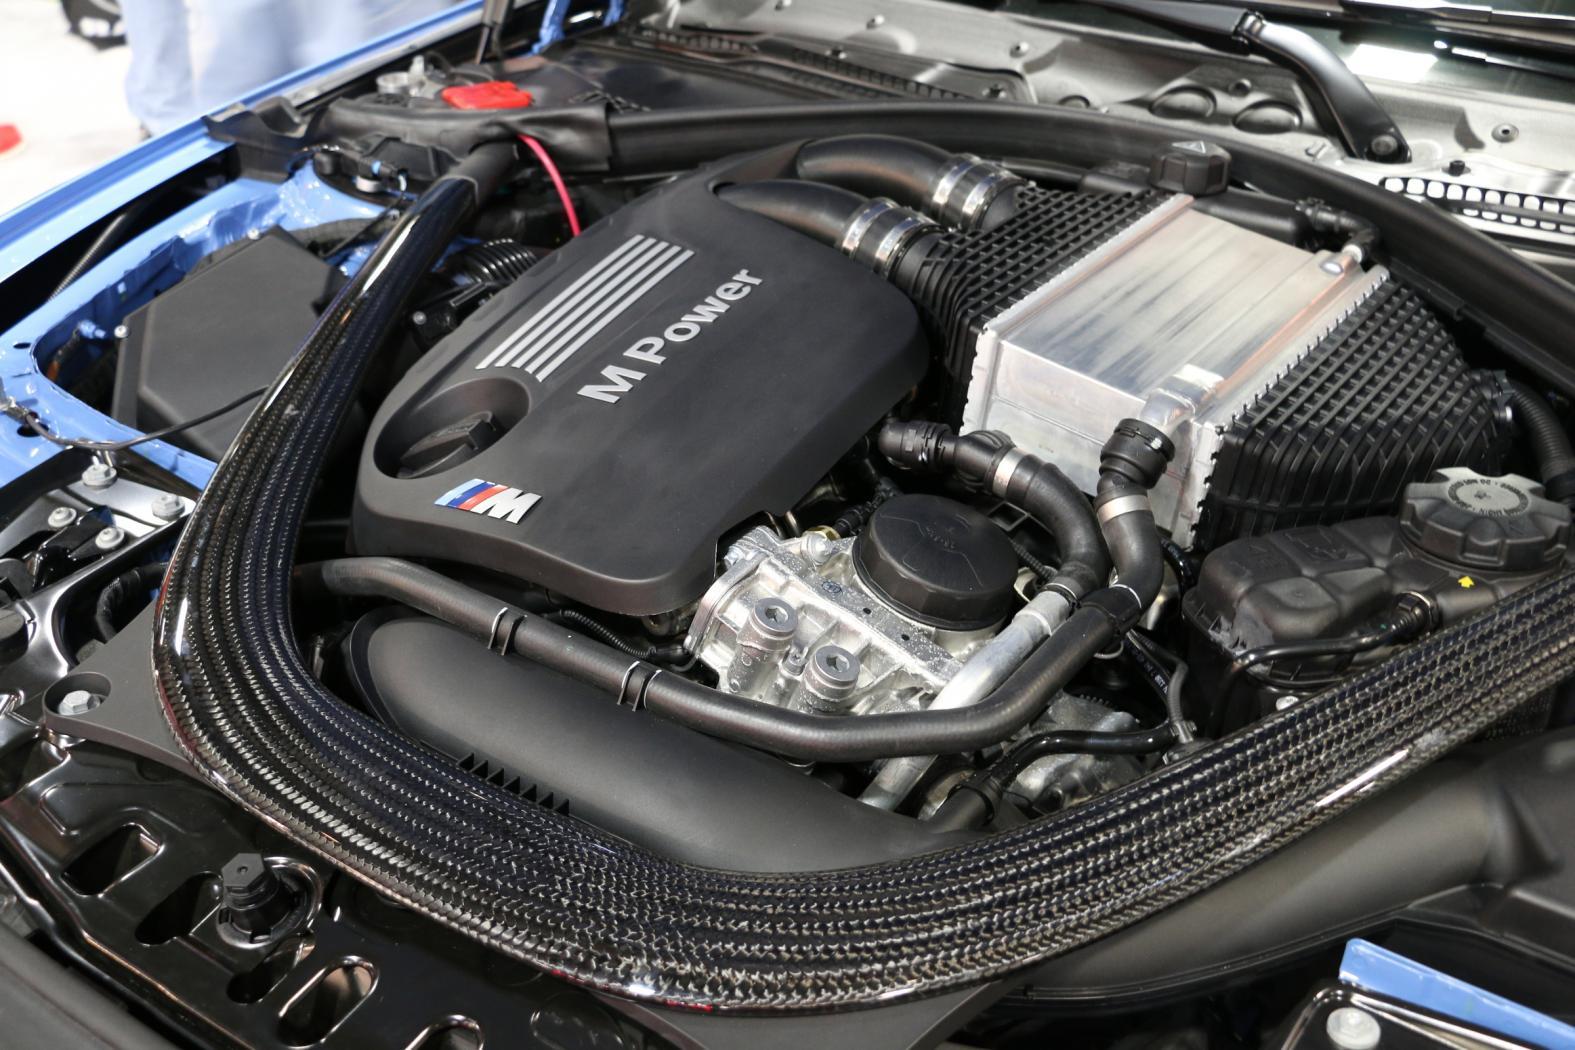 BMW-M3-F80-7.jpeg